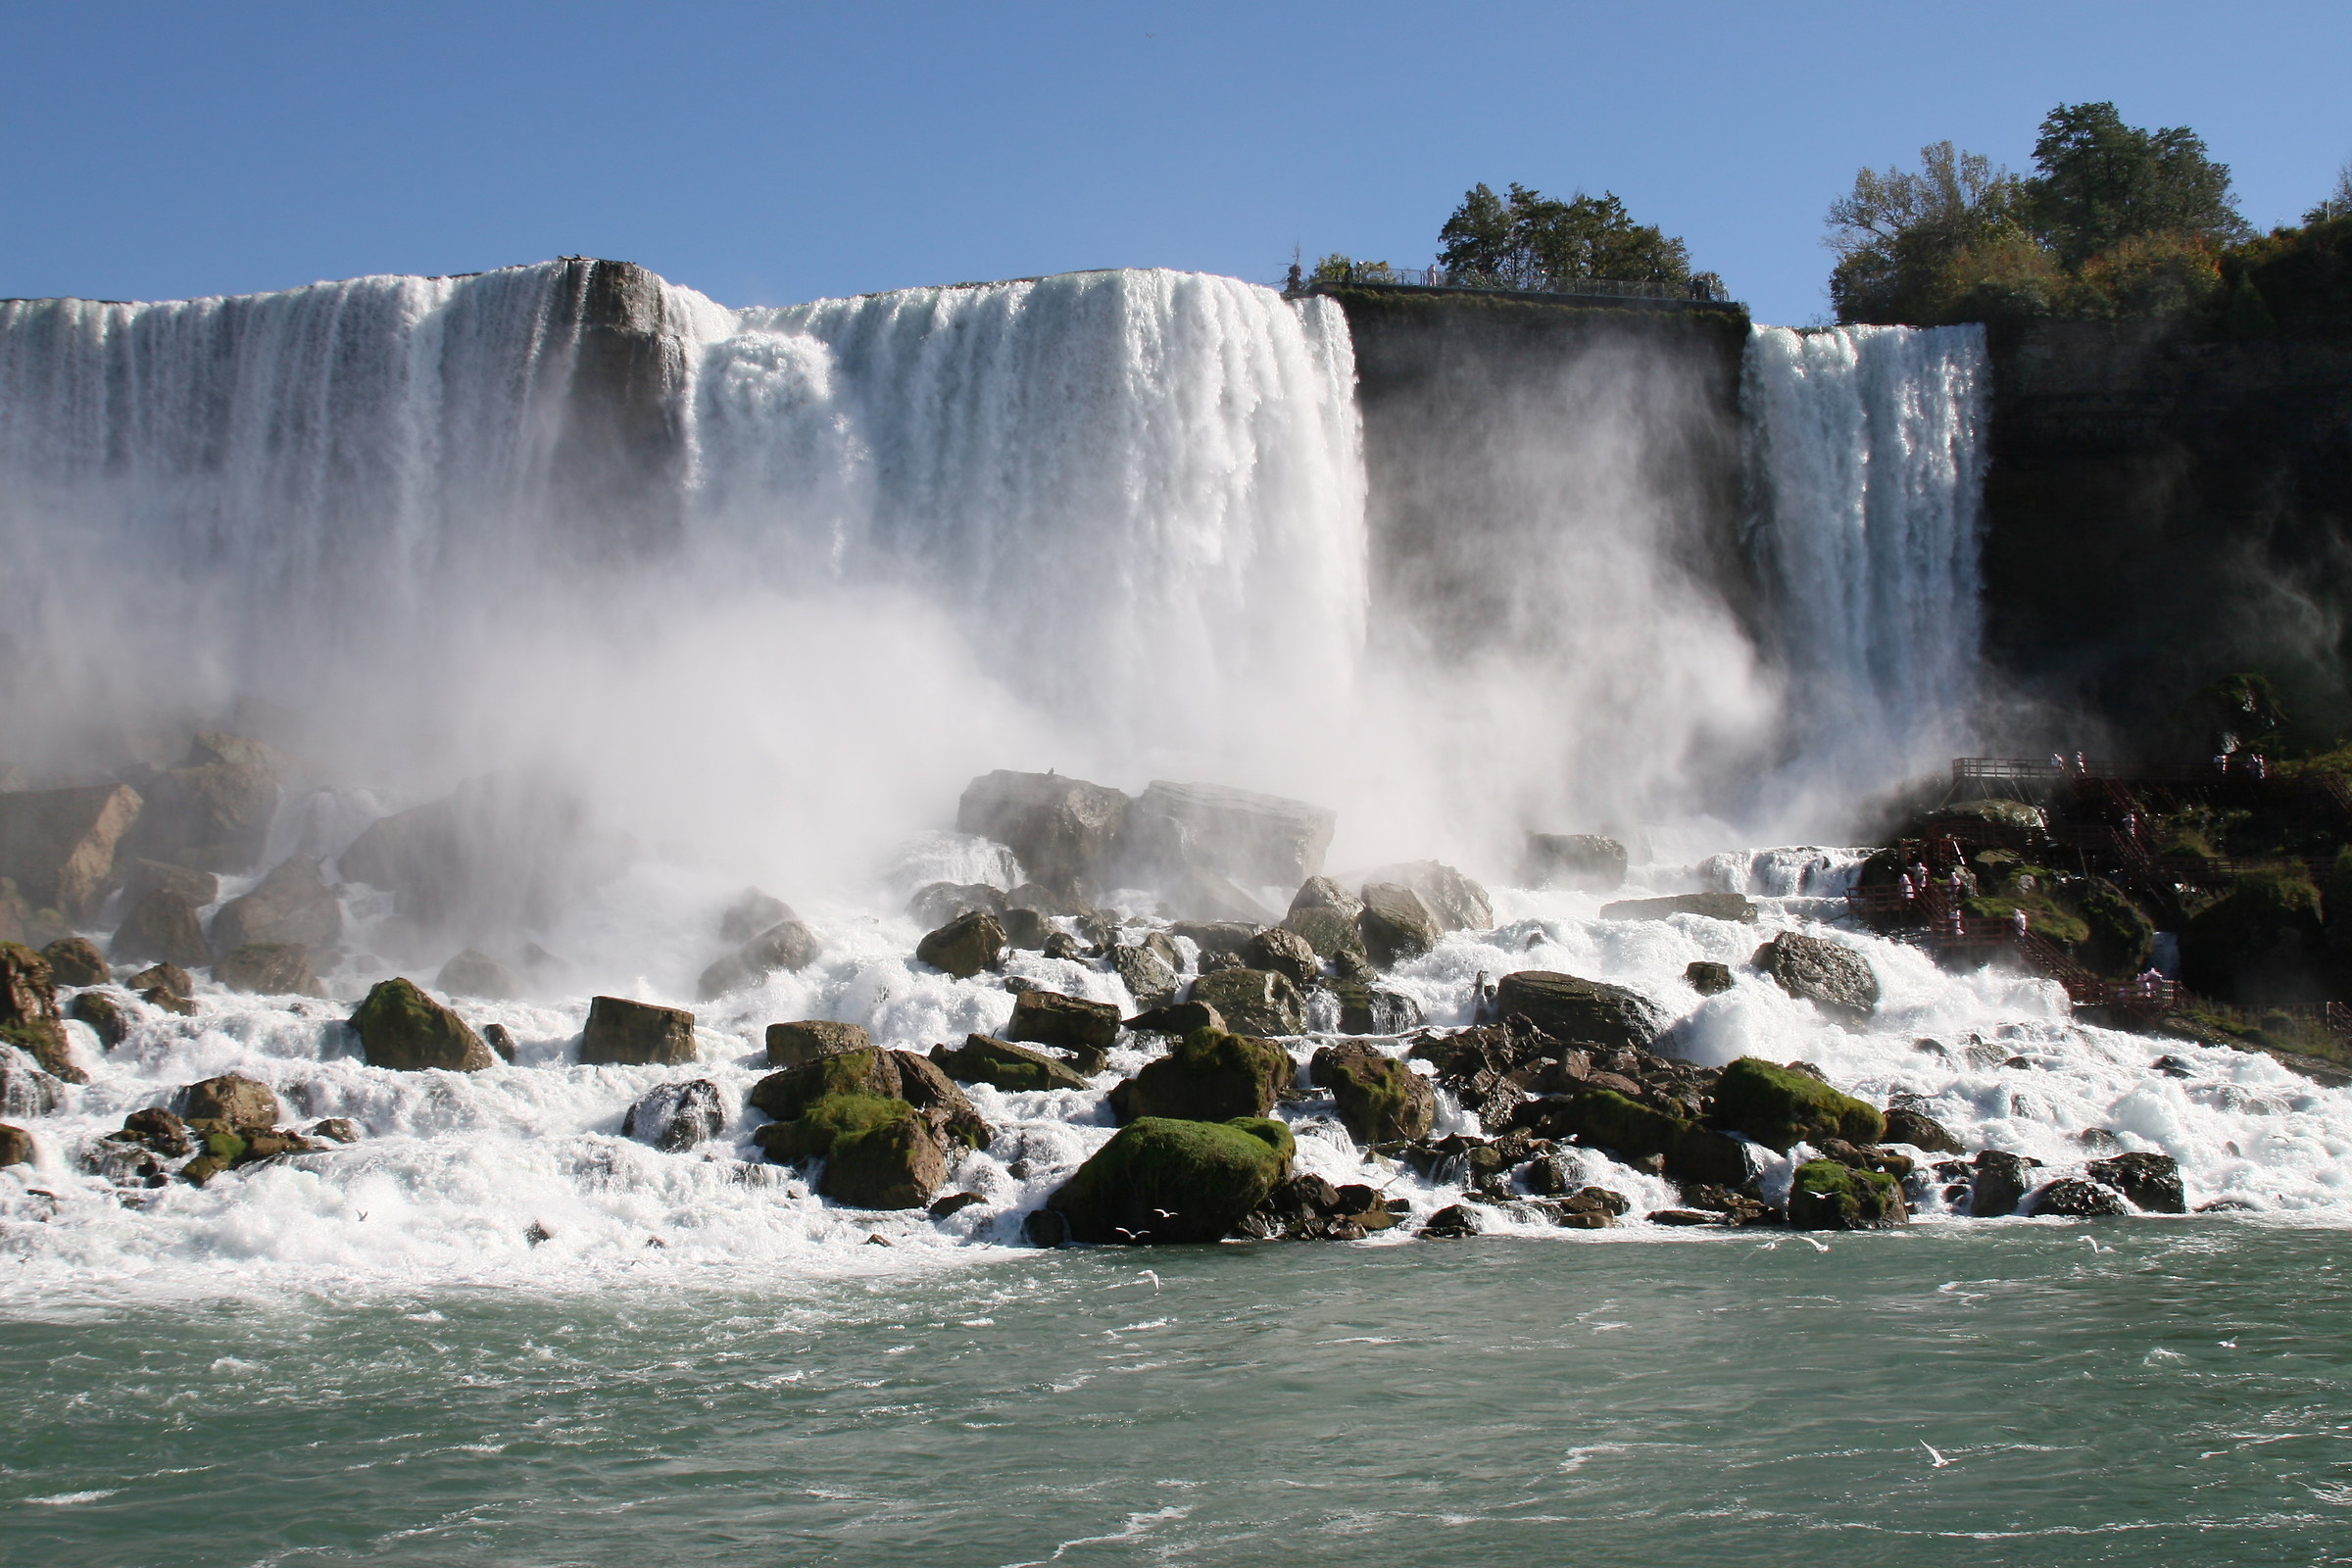 Niagara Falls 2, Canadian side...